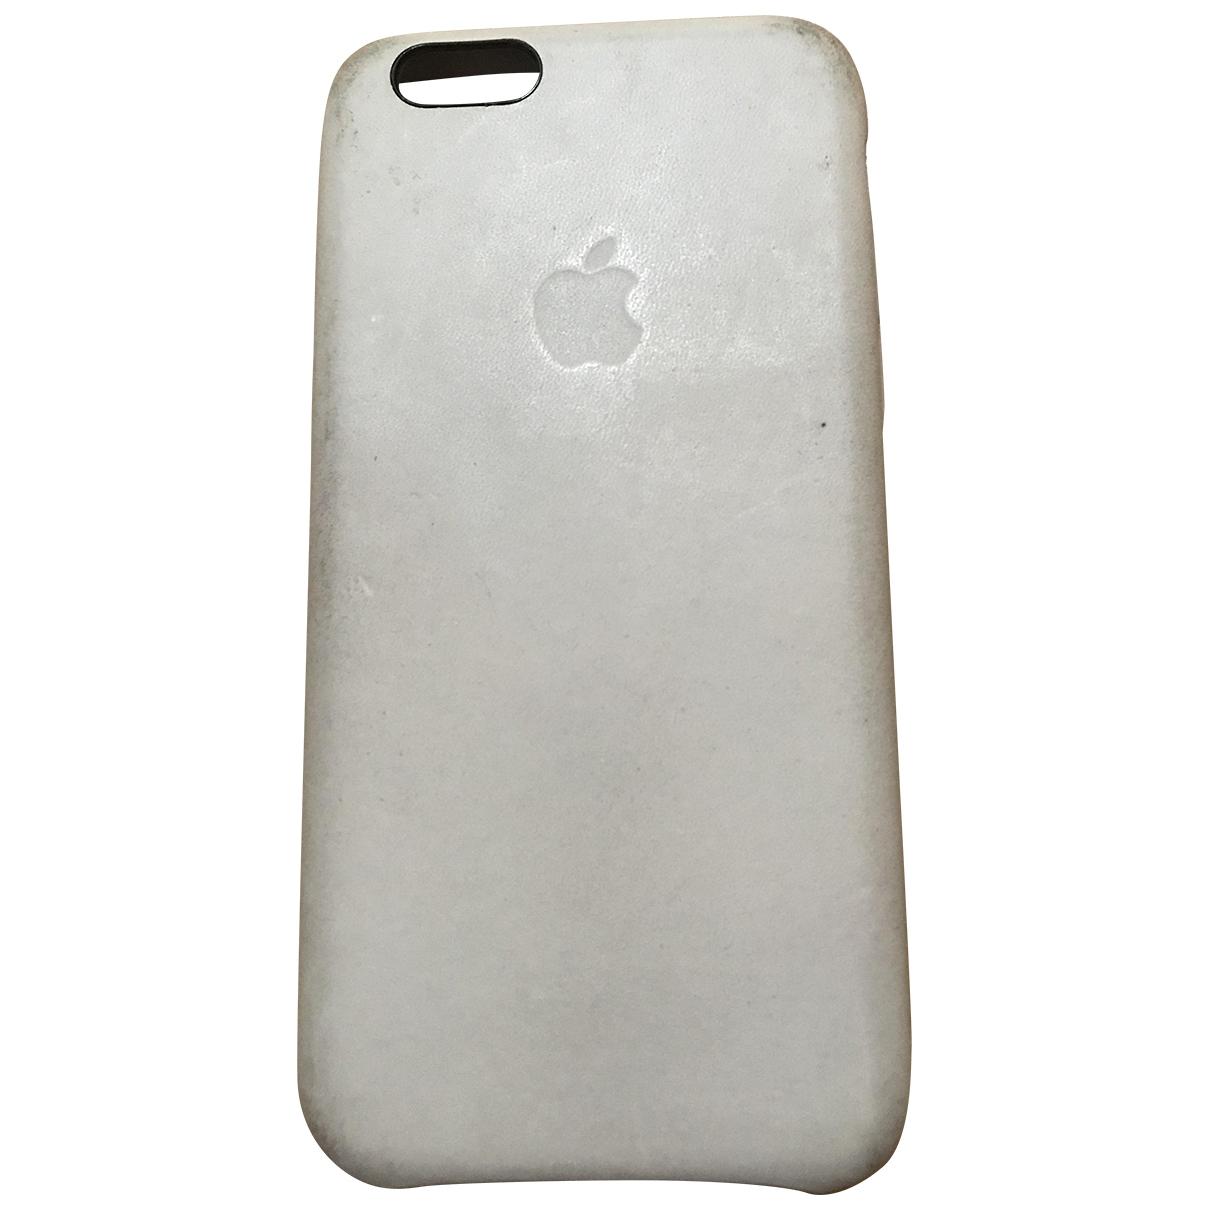 Apple \N Accessoires in  Beige Leder